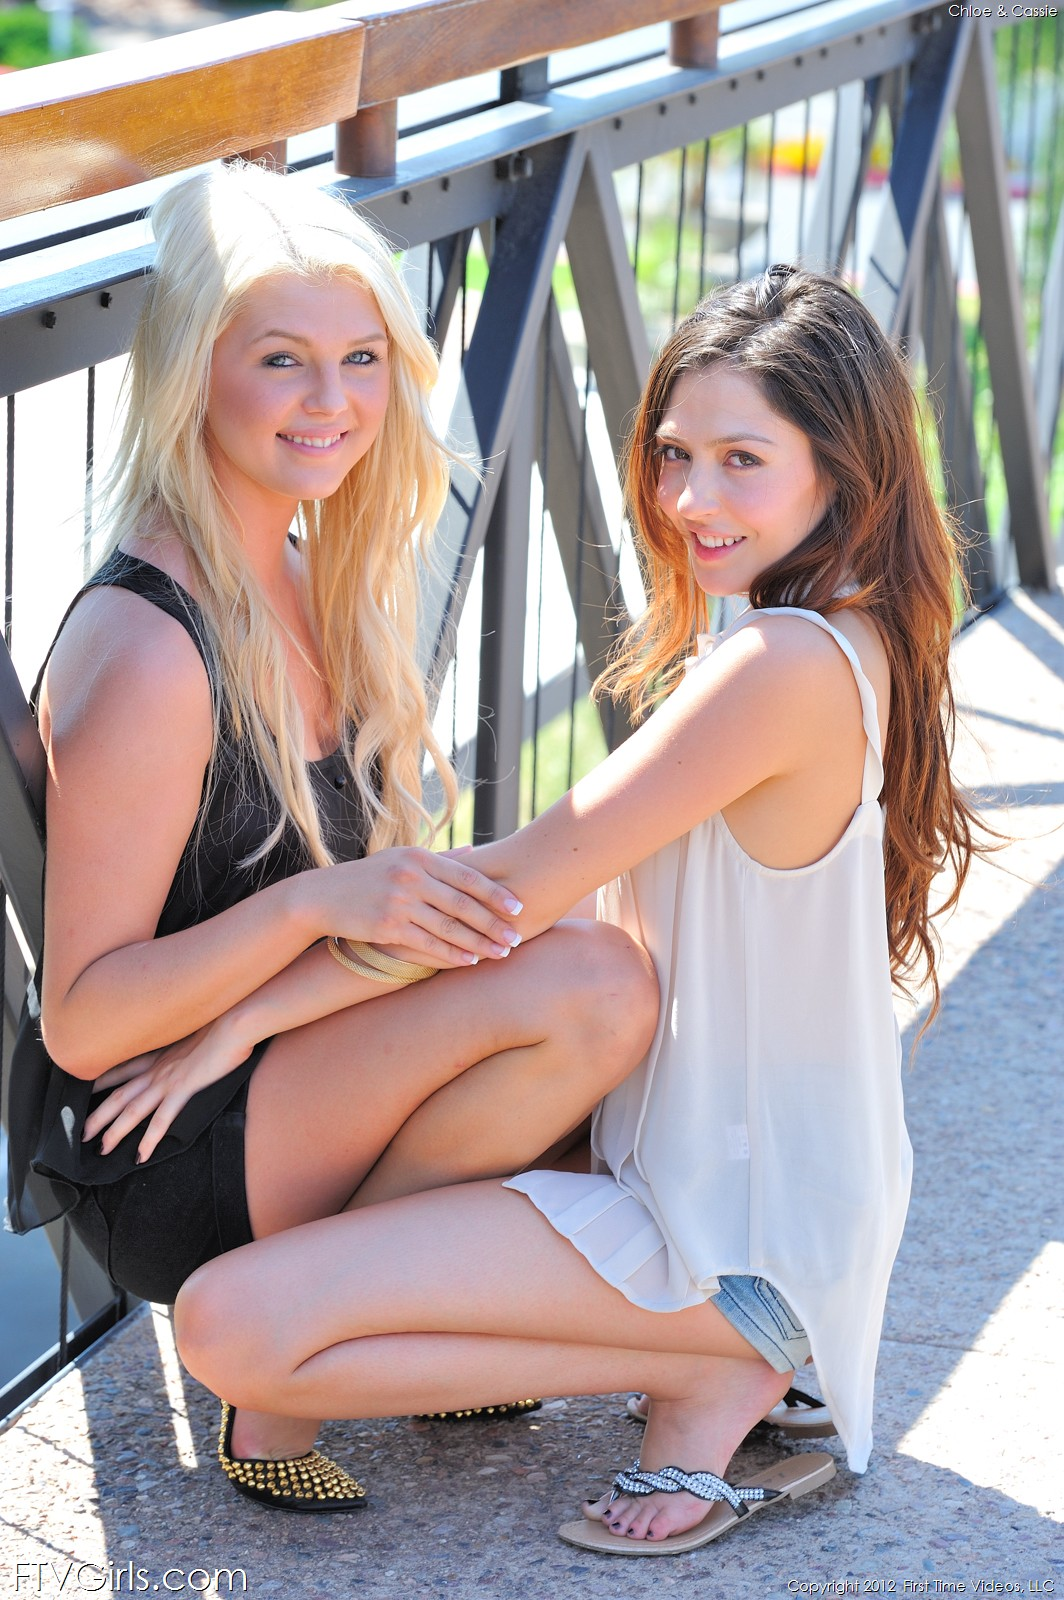 Cassie laine and chloe lynn lesbian